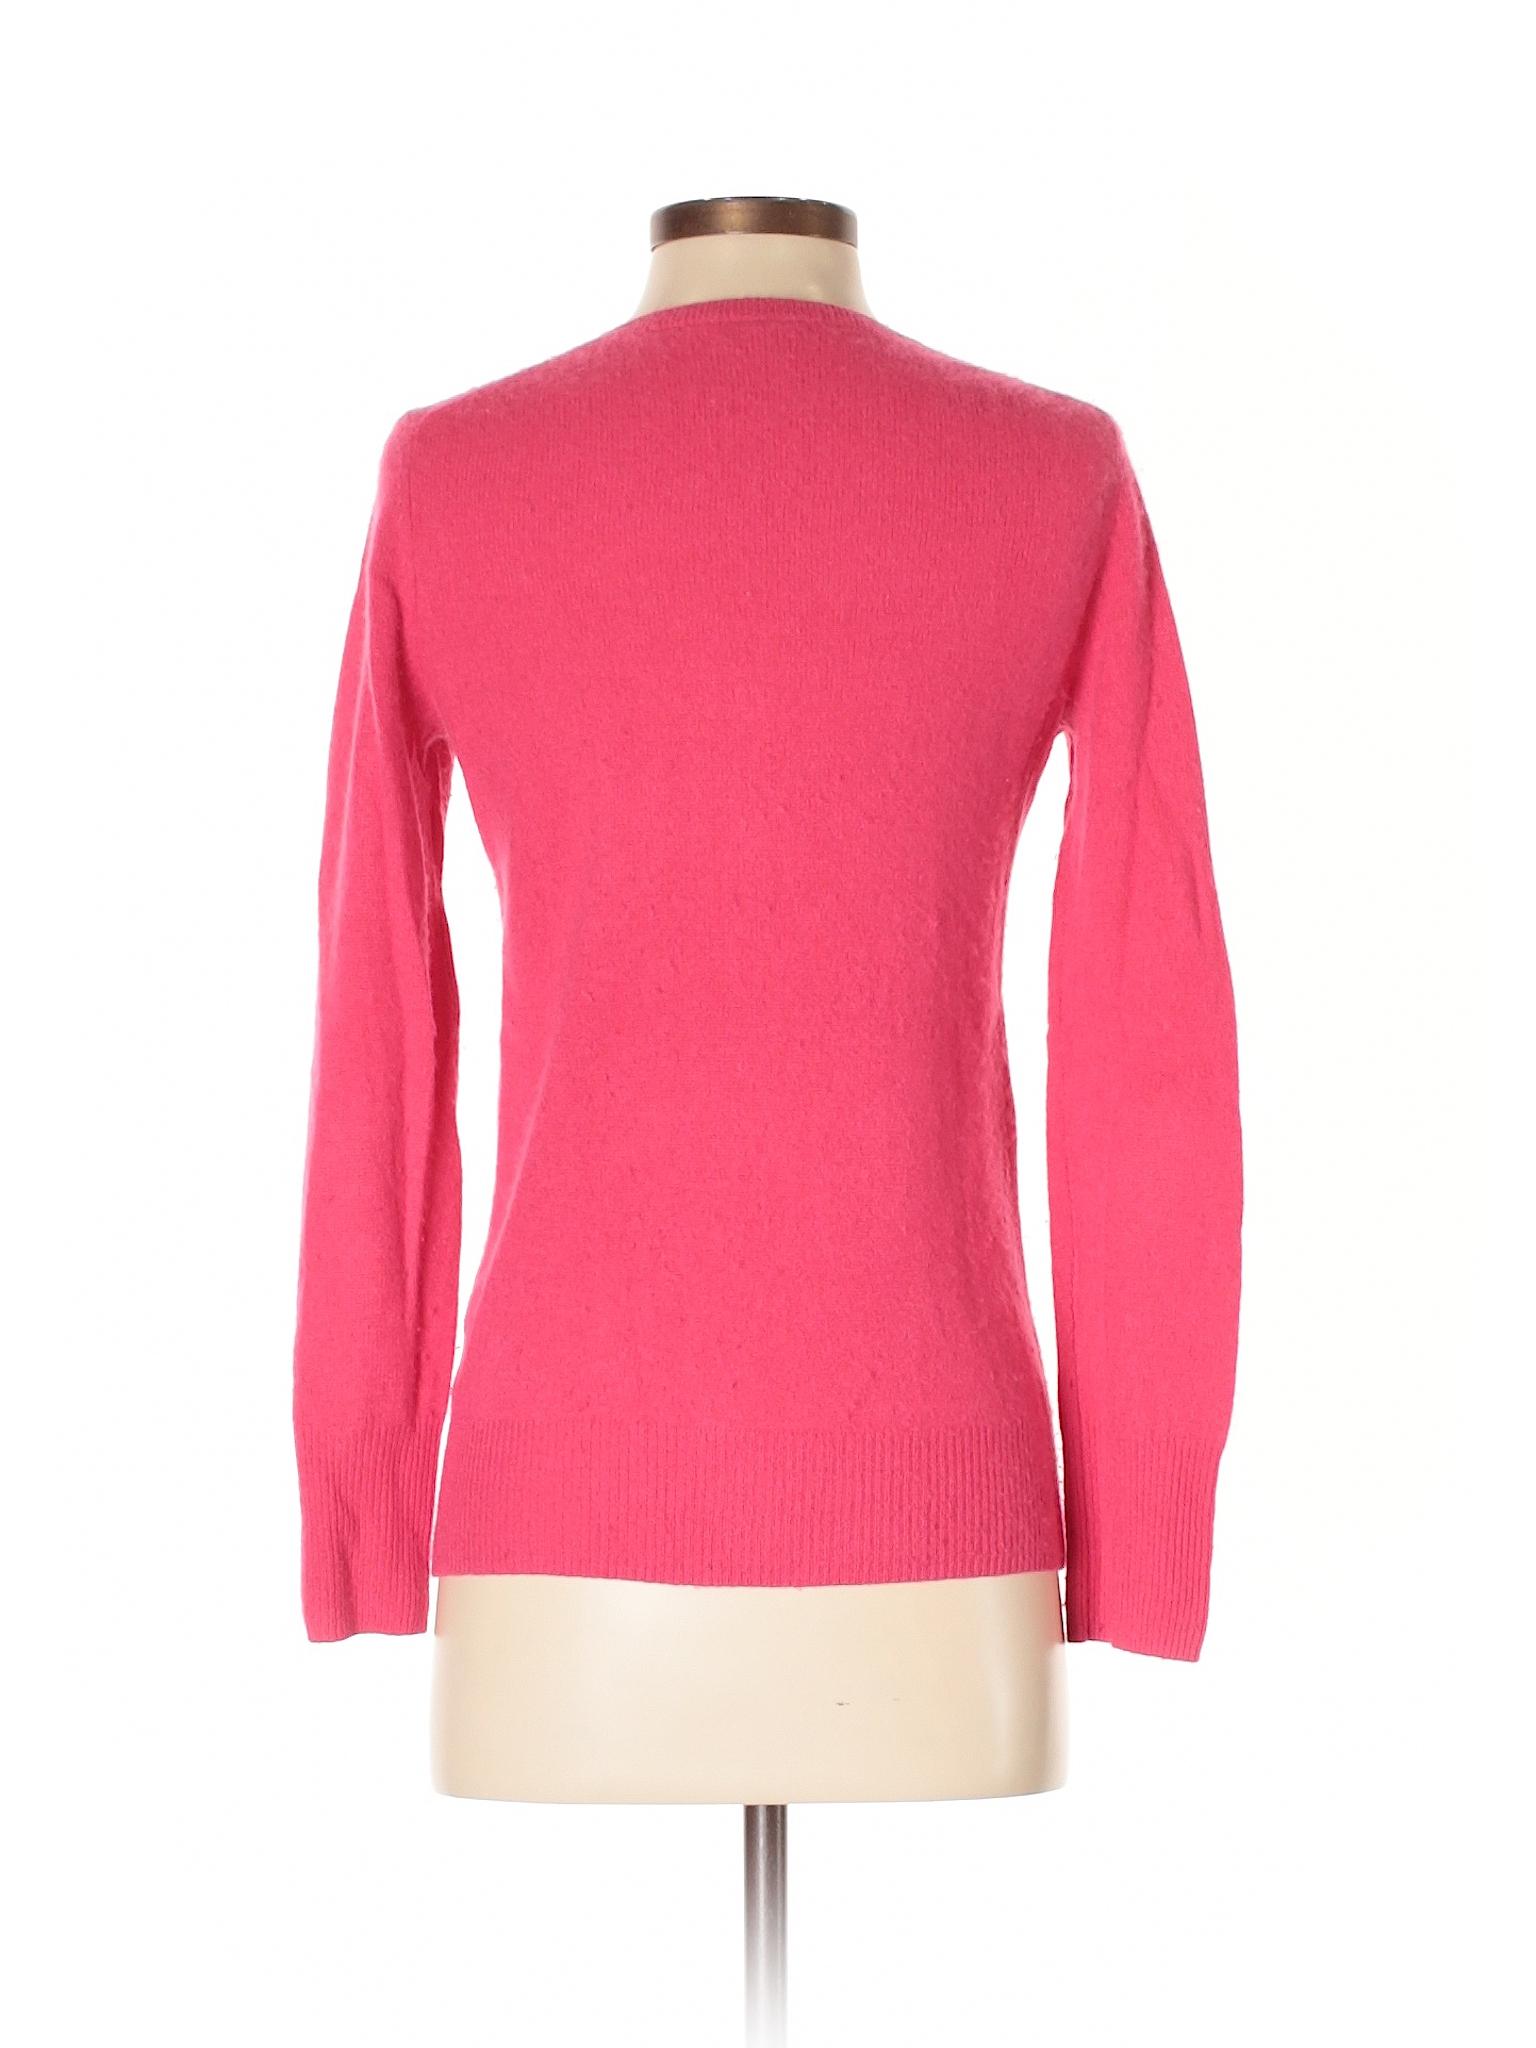 Boutique Sweater Pullover Boutique Halogen Boutique Pullover Halogen Pullover Halogen Sweater Sweater Halogen Boutique Sweater Pullover TZrw5qITx